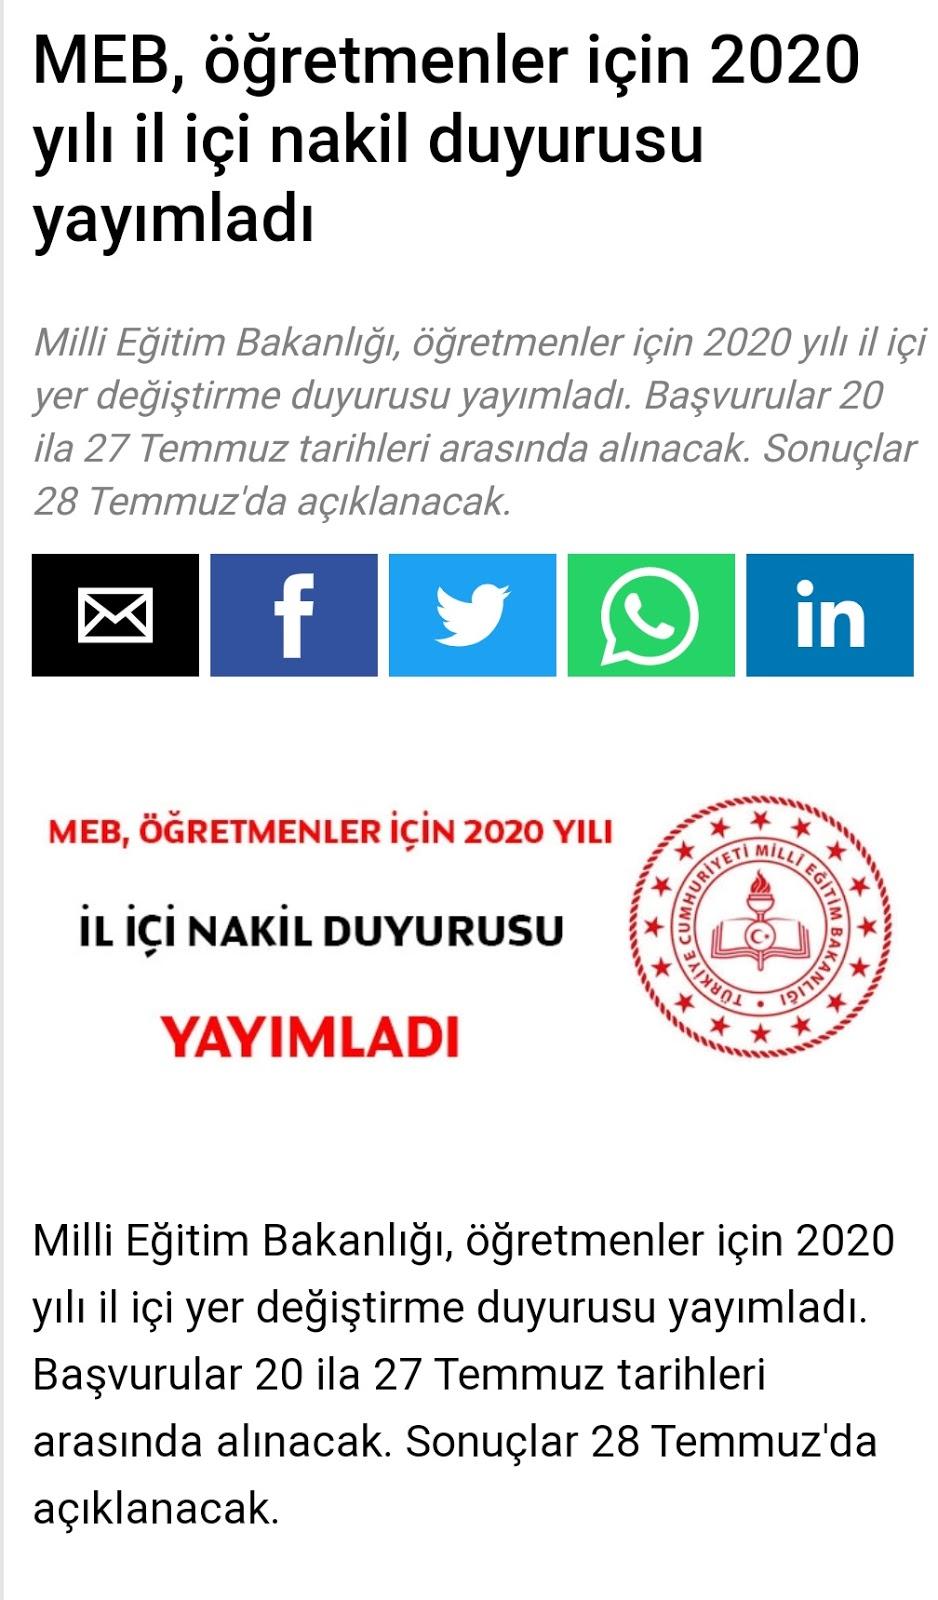 2020 il içi